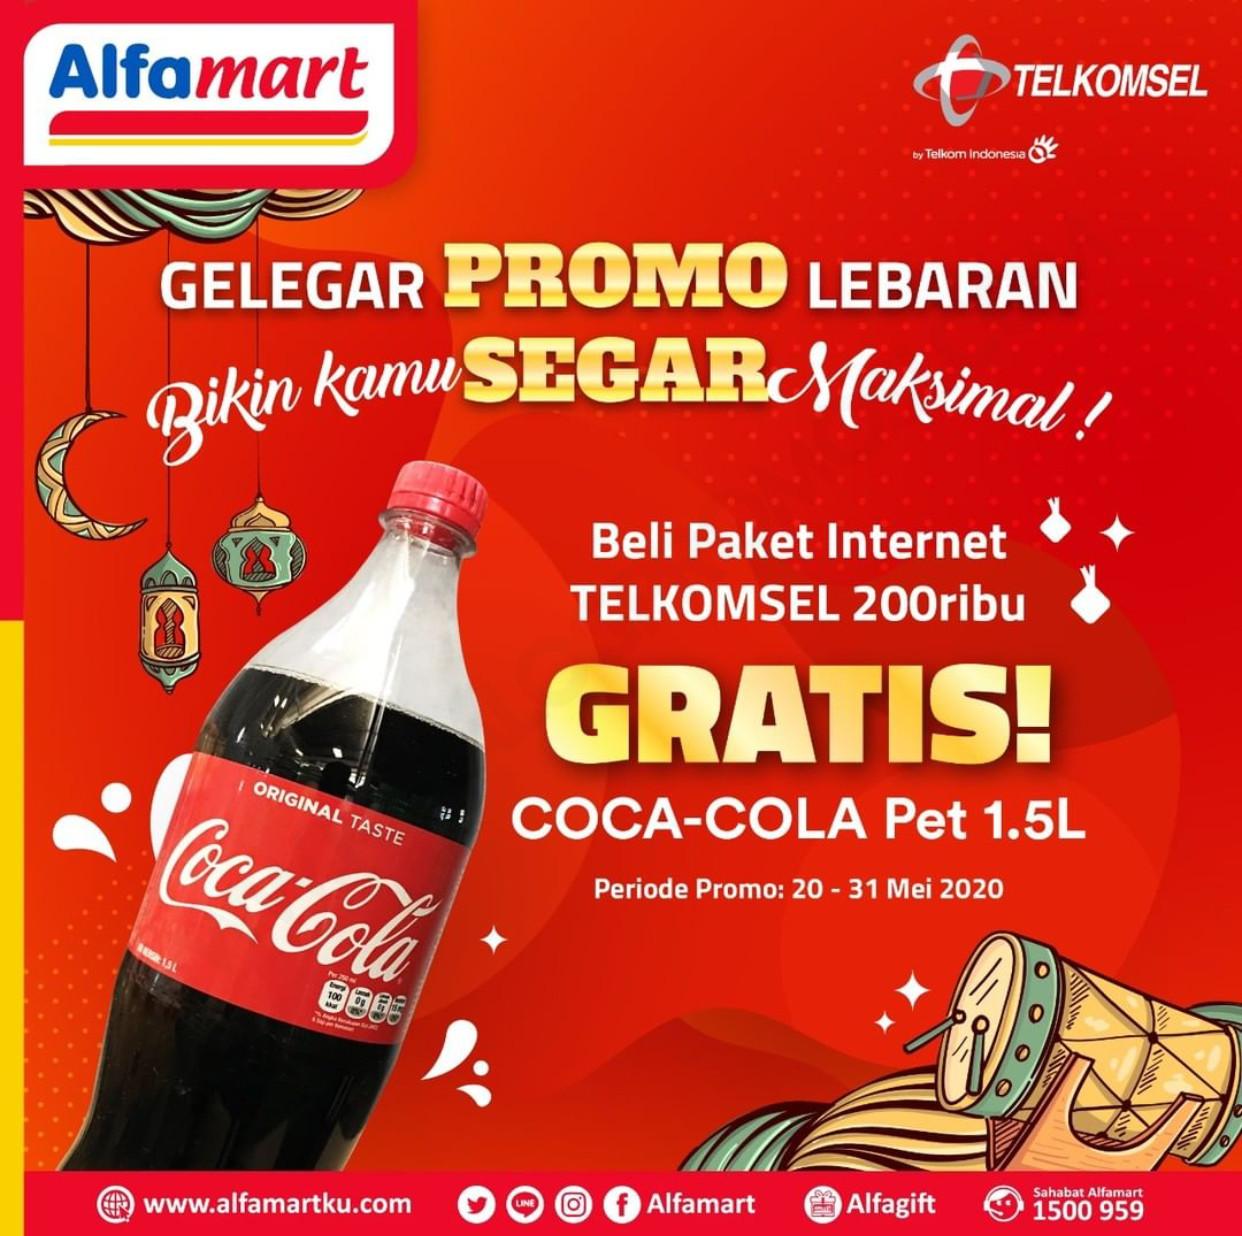 Promo Alfamart Gratis Cocacola Tiap Beli Paket Internet Telkomsel 20 - 31 Mei 2020